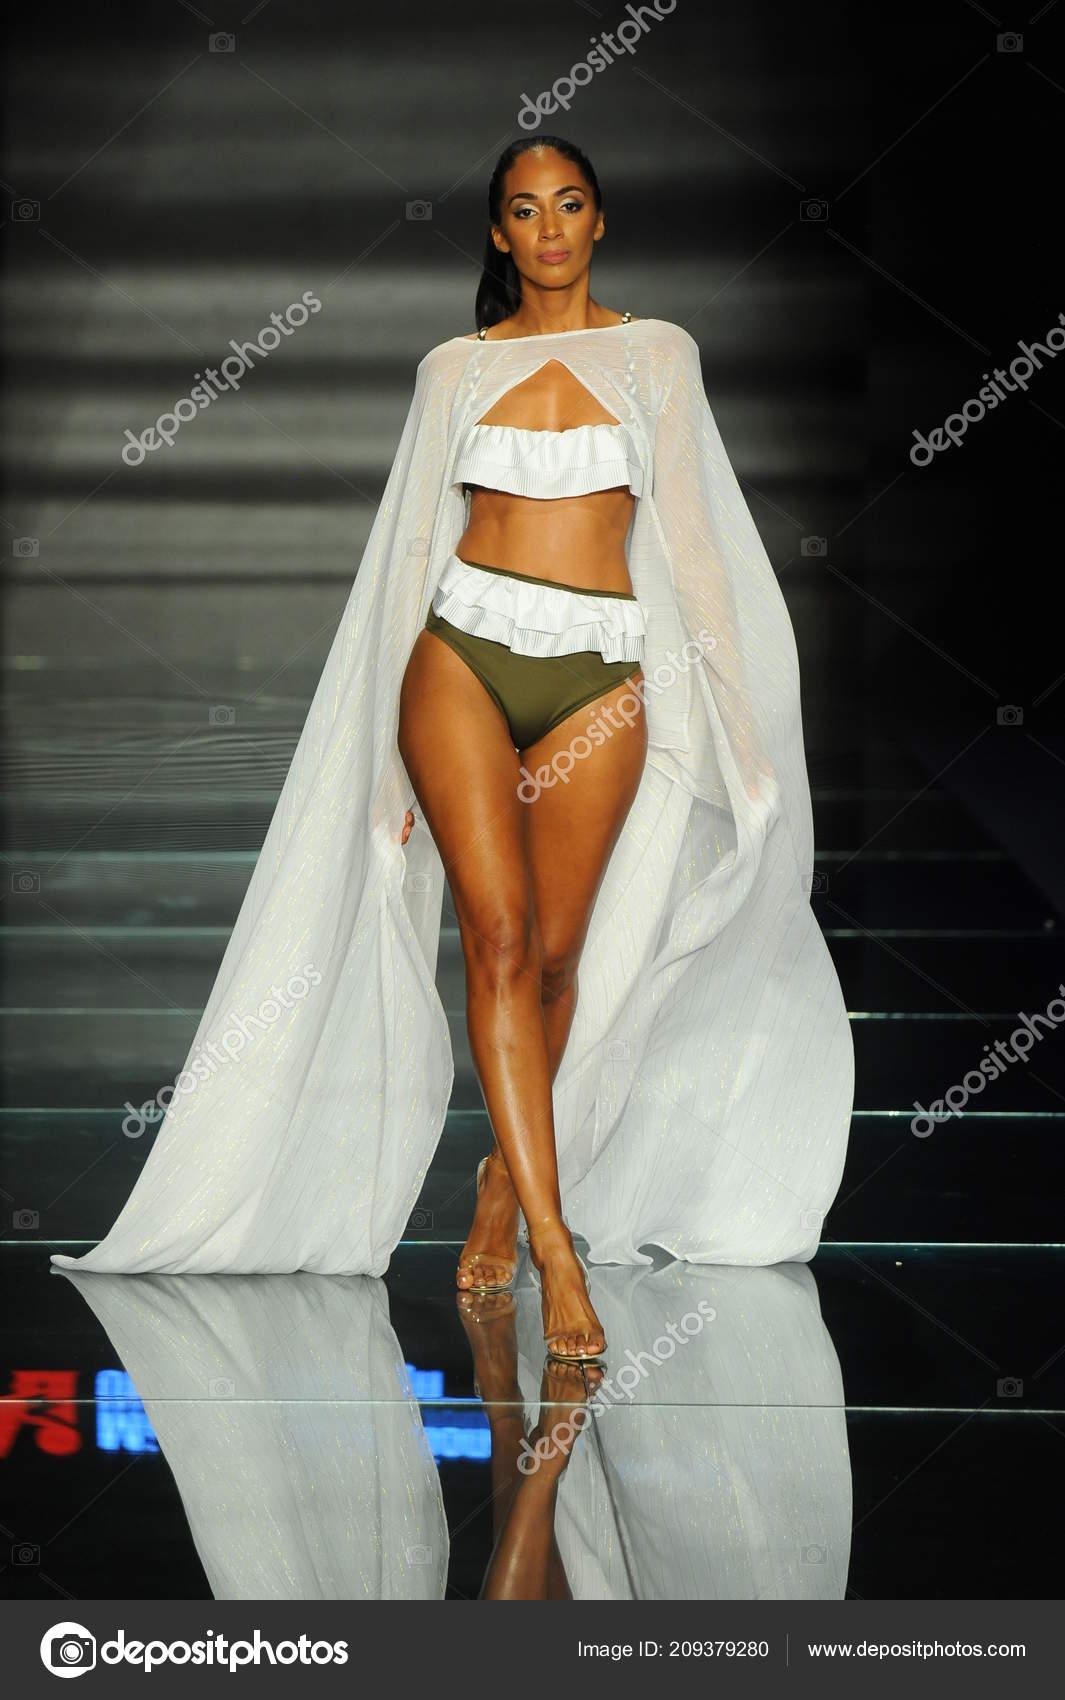 Miami Beach July Model Wears Fashions Design Students Miami International Stock Editorial Photo C Fashionstock 209379280